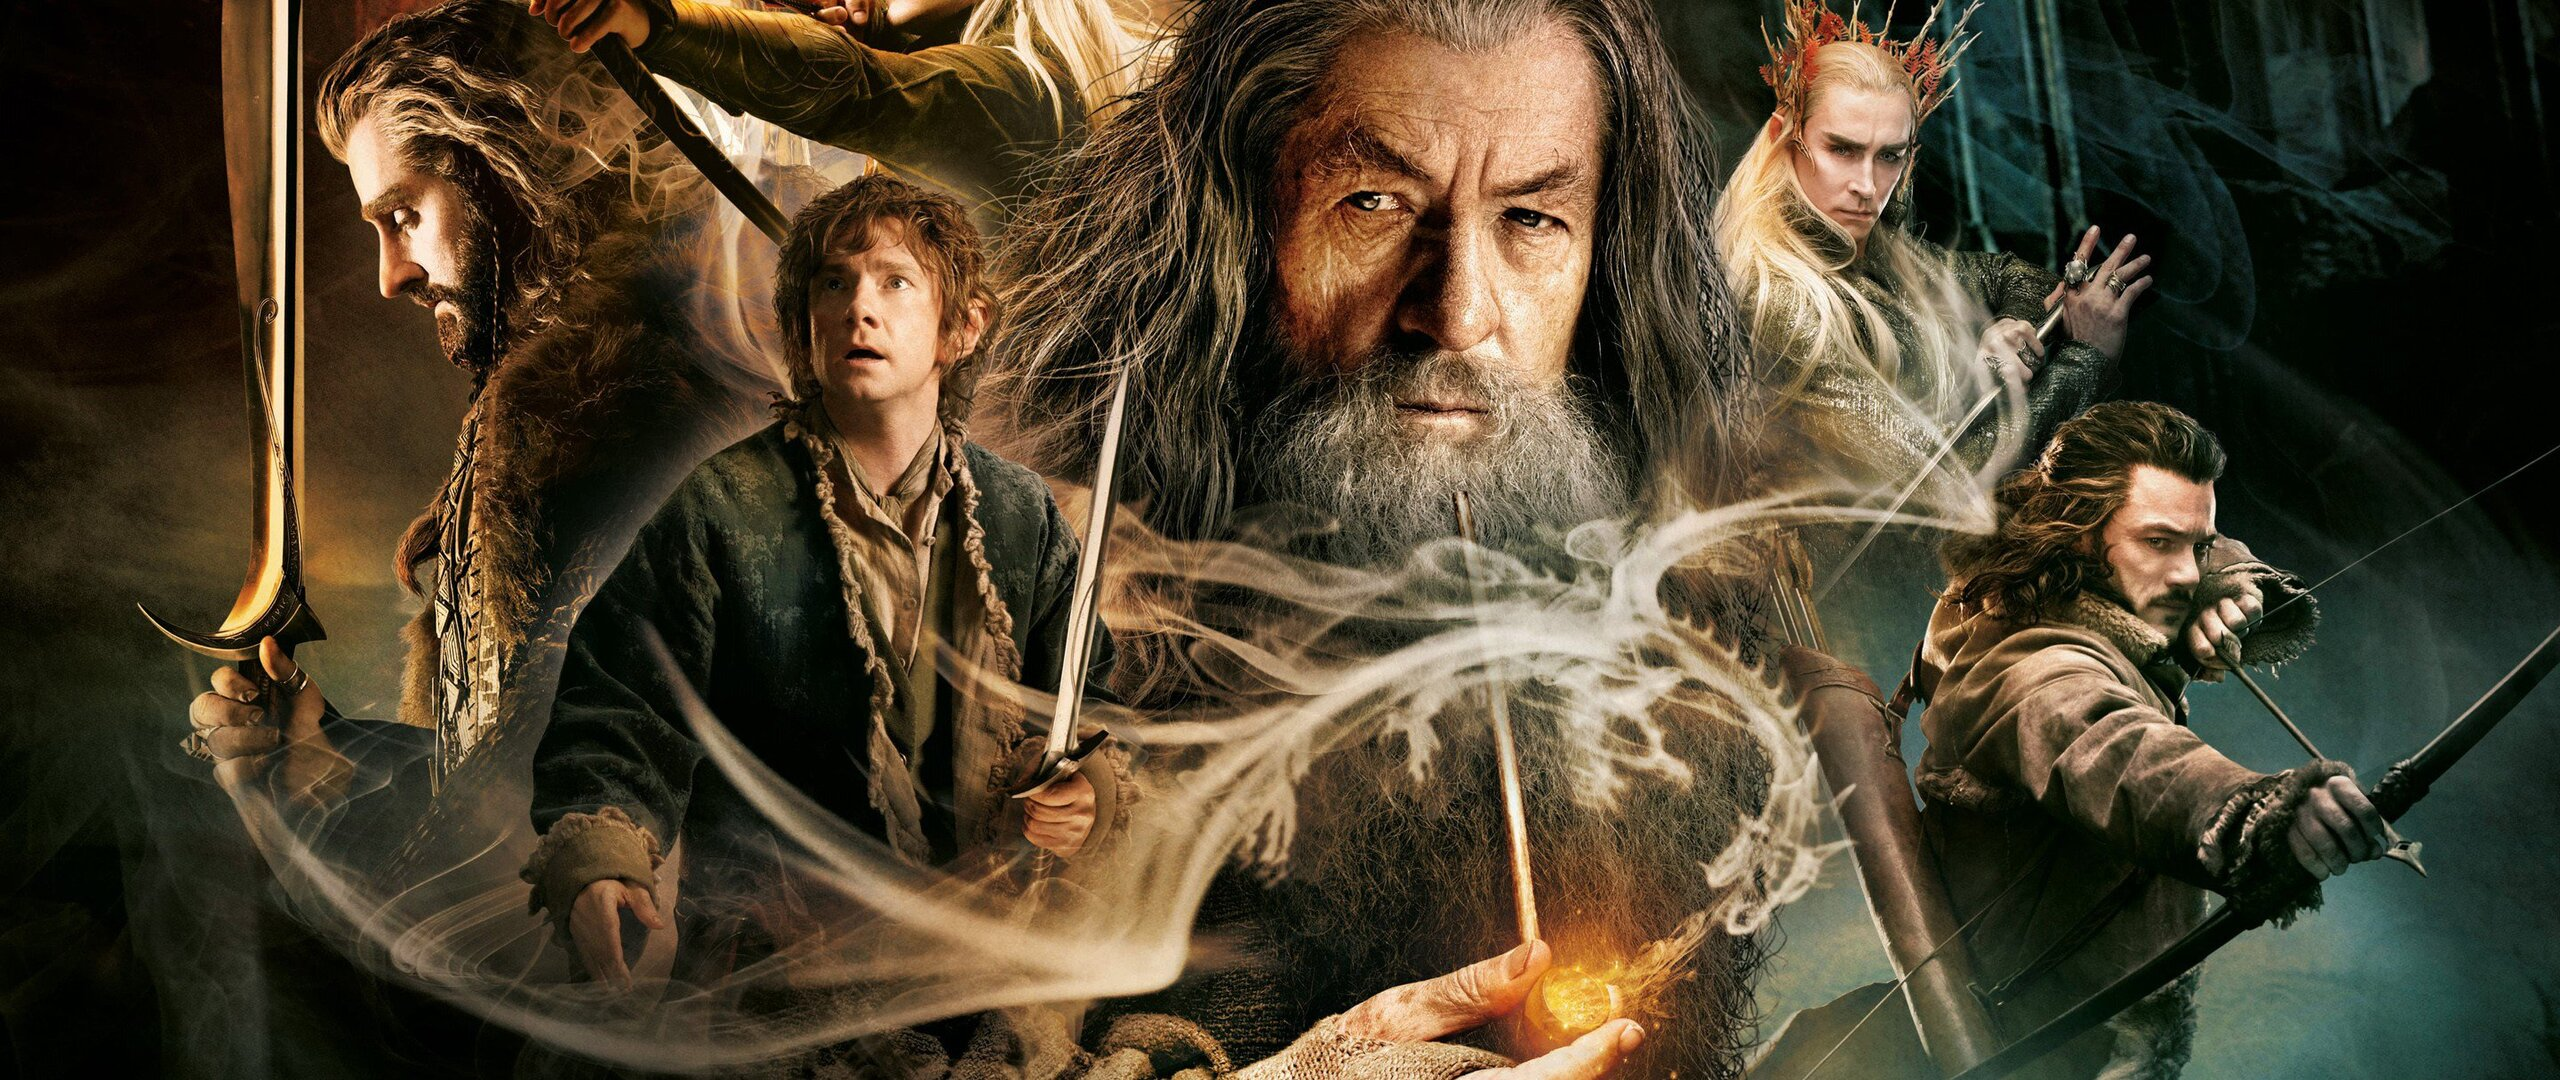 2560x1080 the hobbit the desolation of smaug 2560x1080 resolution hd